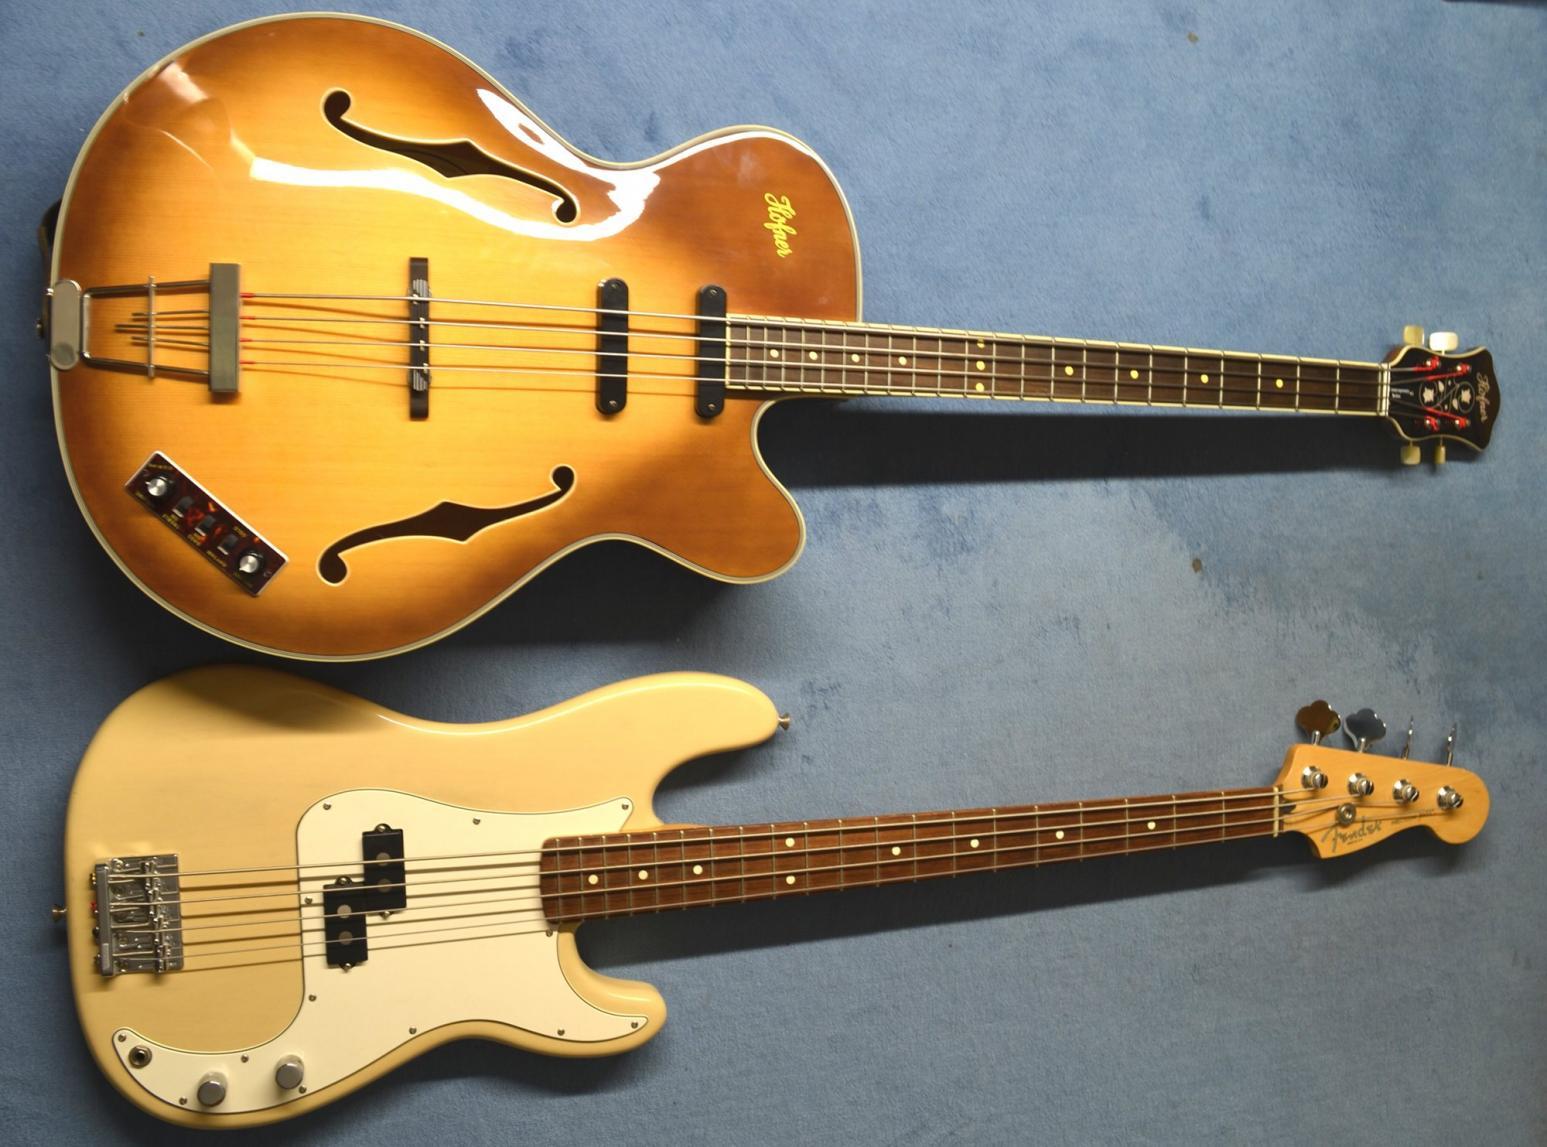 Berühmt Bassgitarre Verkabelung Fotos - Elektrische Schaltplan-Ideen ...